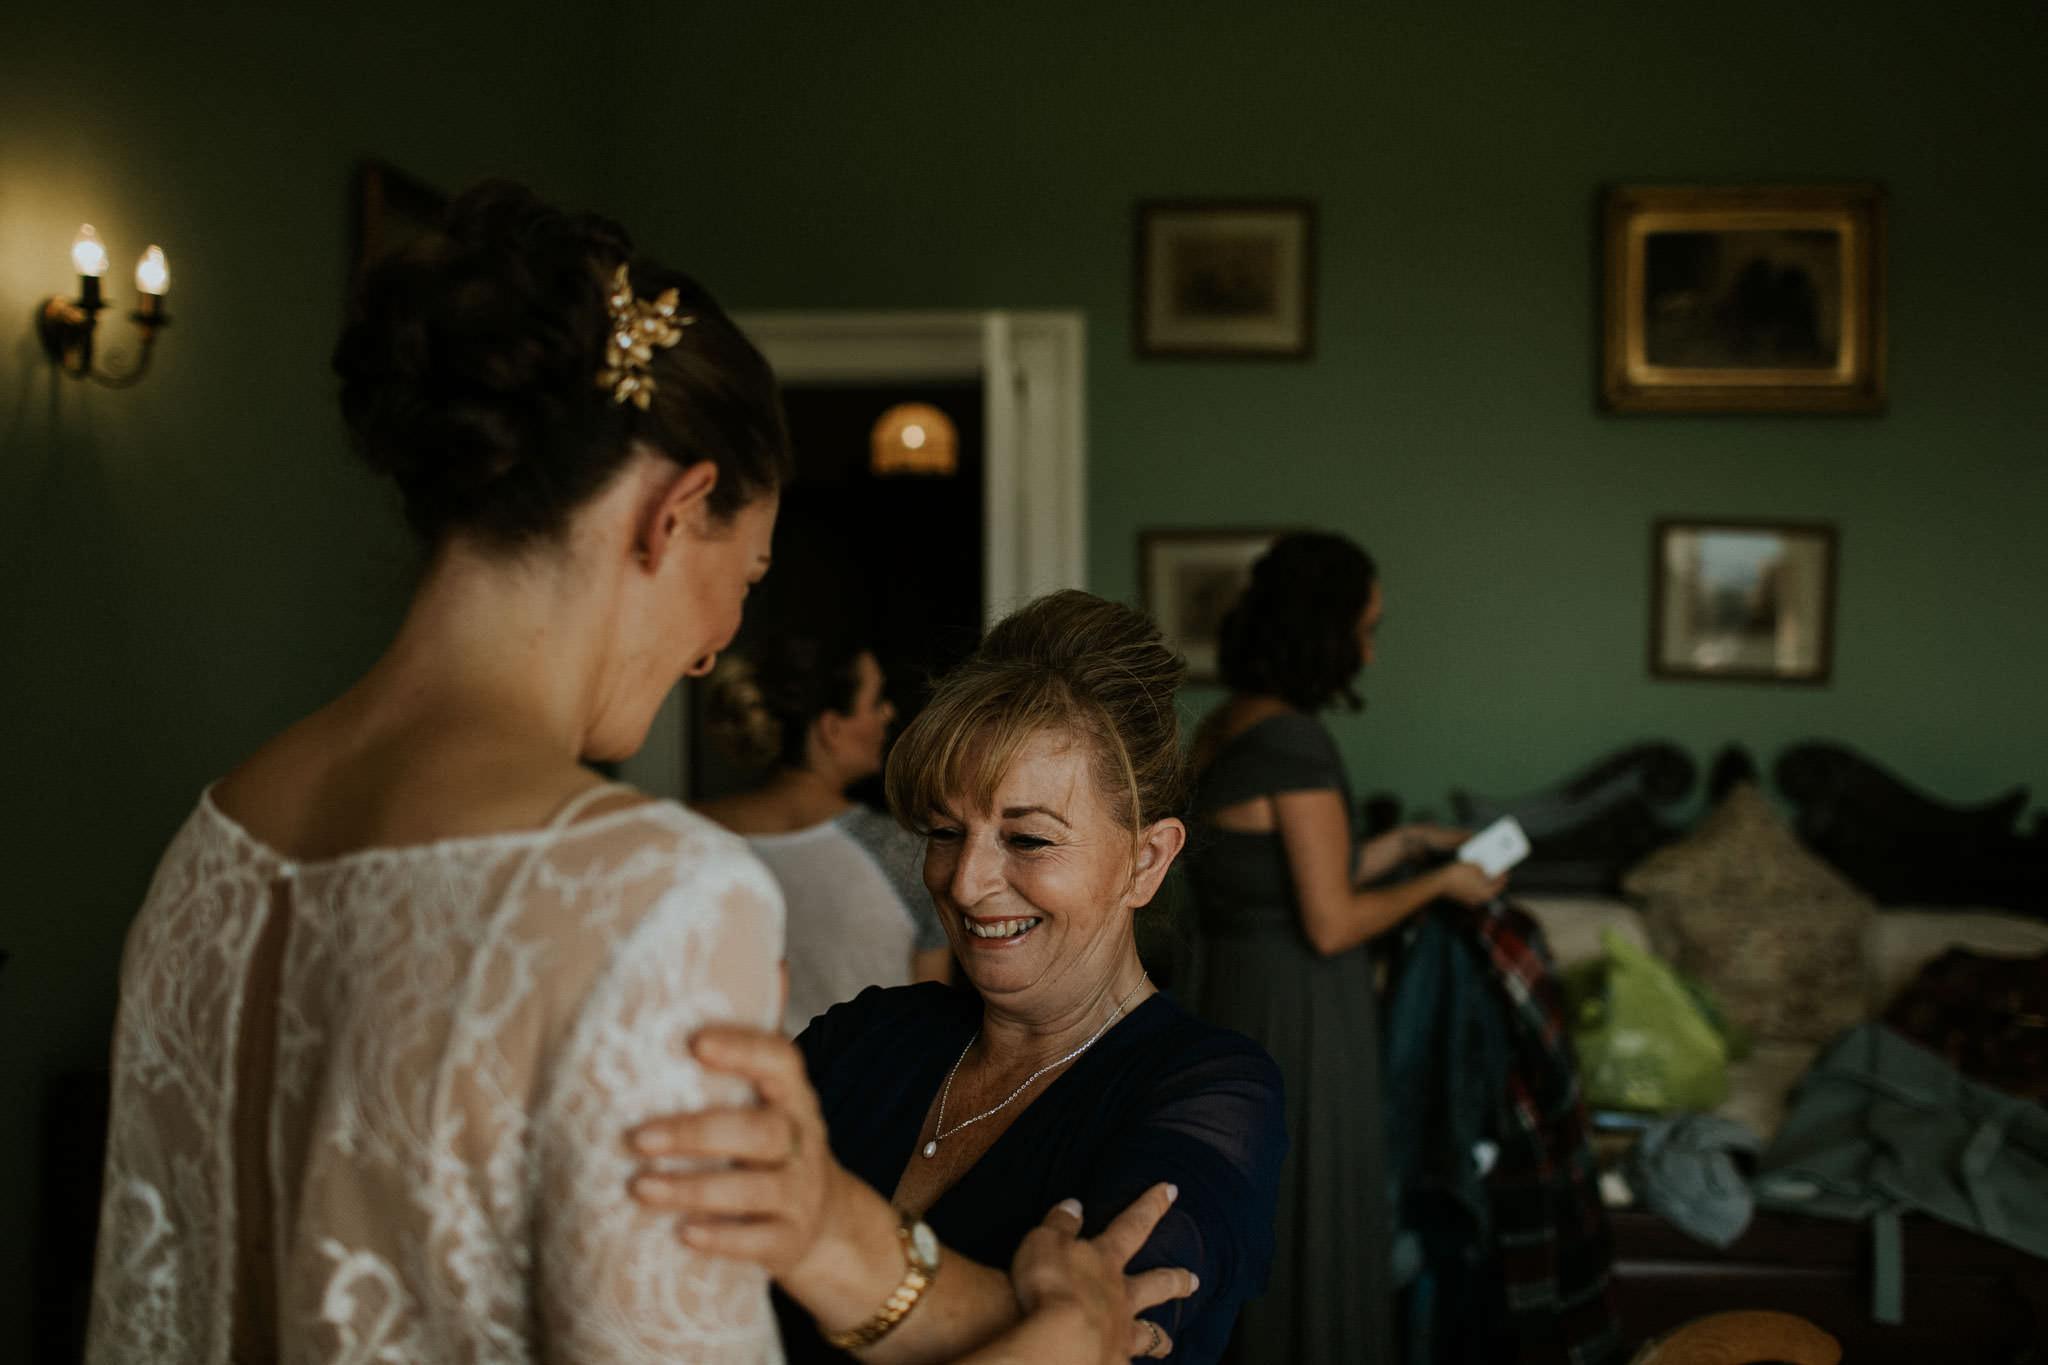 fine-art-wedding-photography-scotland 025